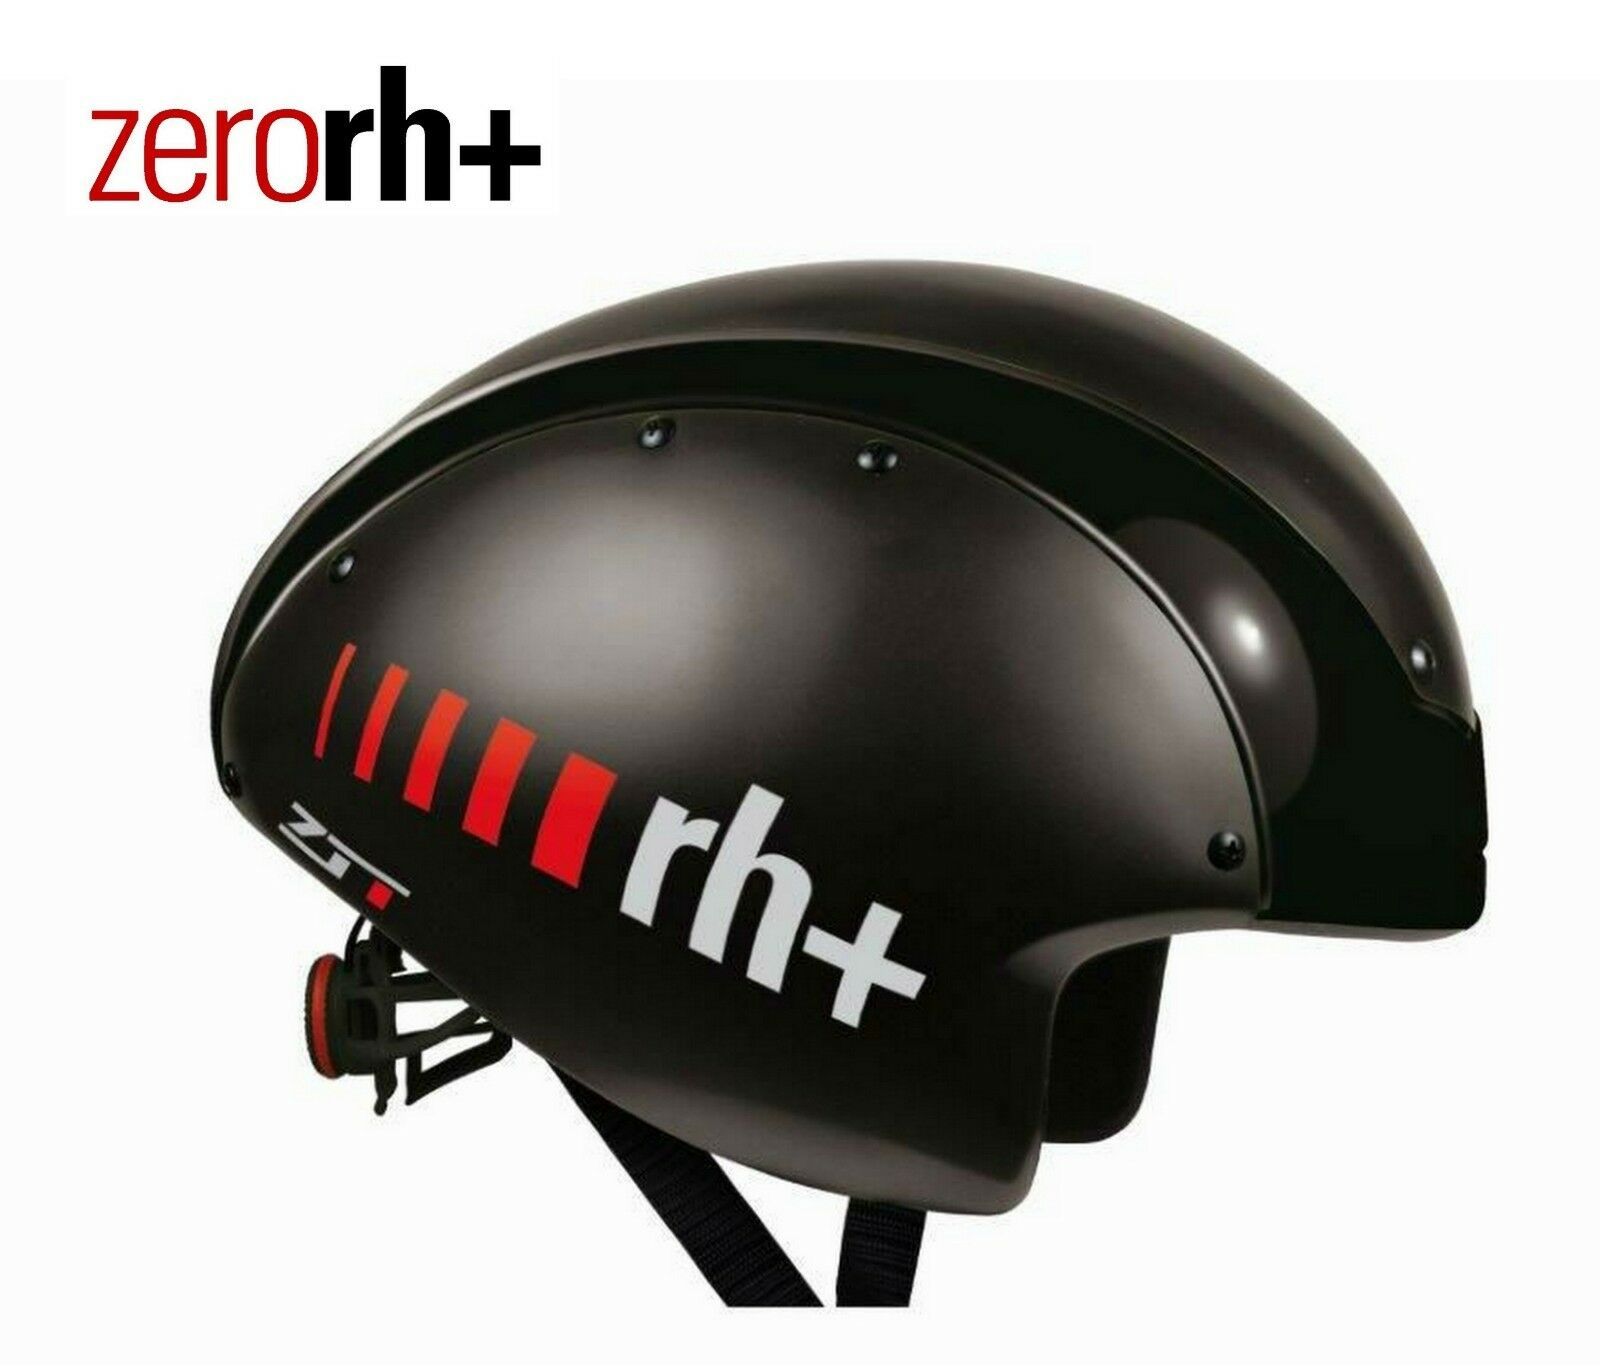 Zero RH+ ZTT  Helmet XS  M 54-57 cm zerorh ZTT Triathlon Helmet  hastened to see